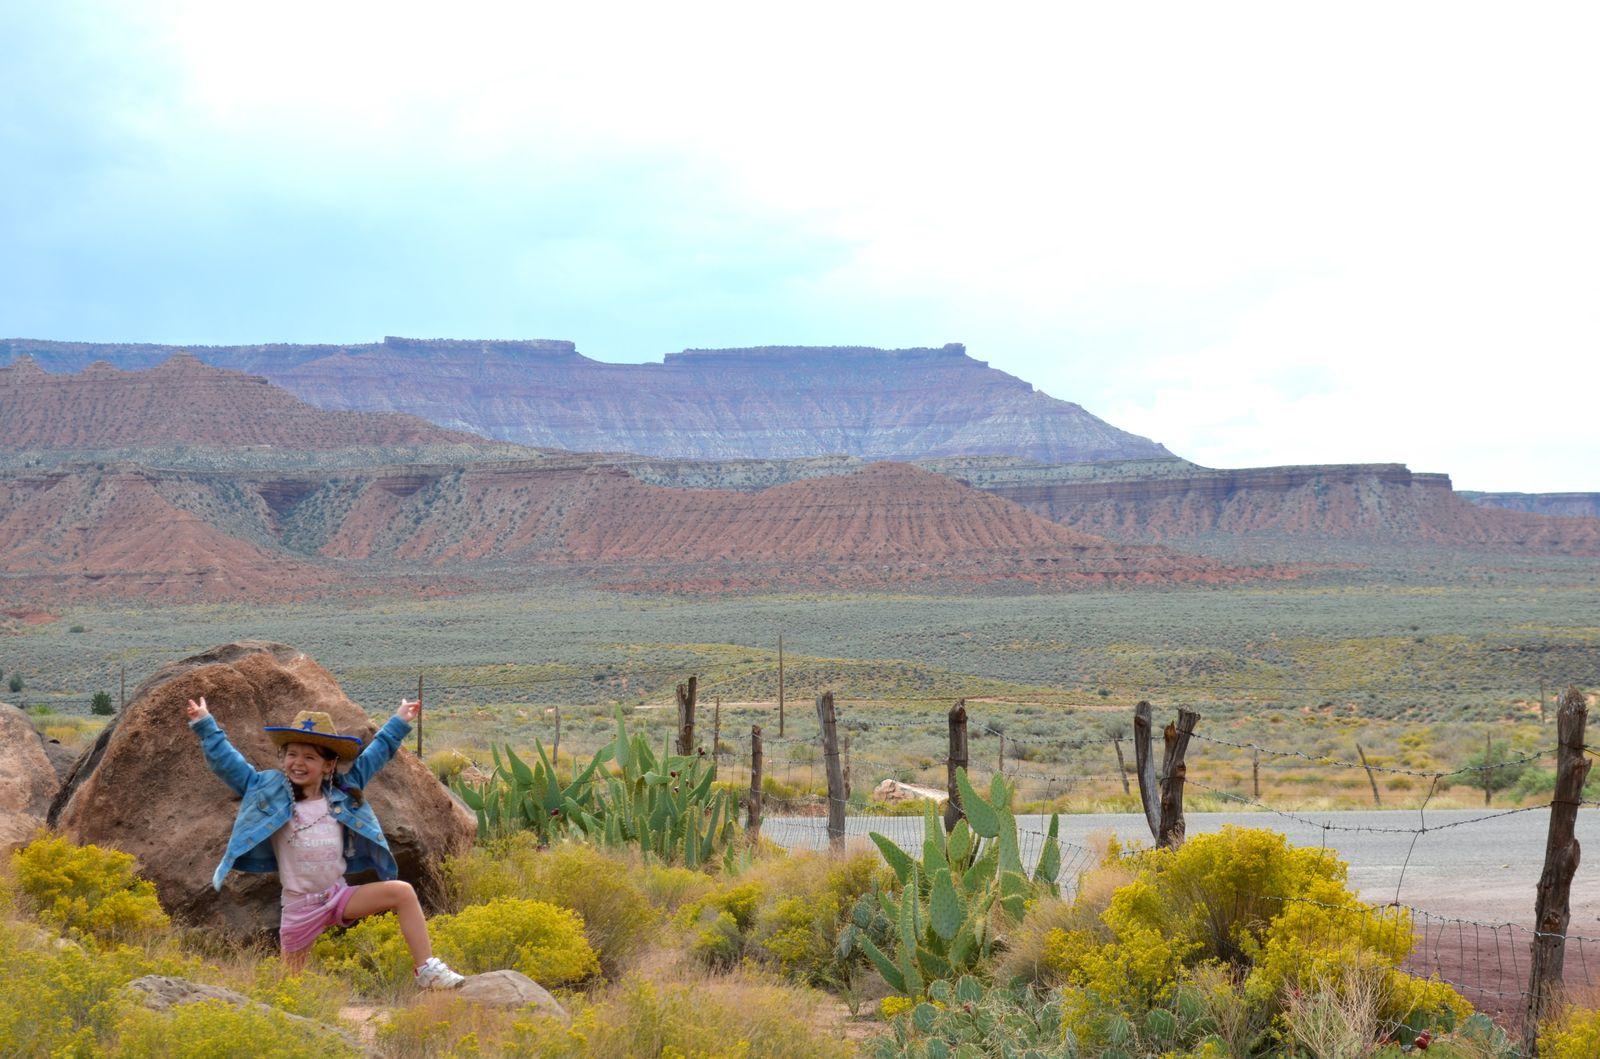 Jour 9: Zion to Vegas